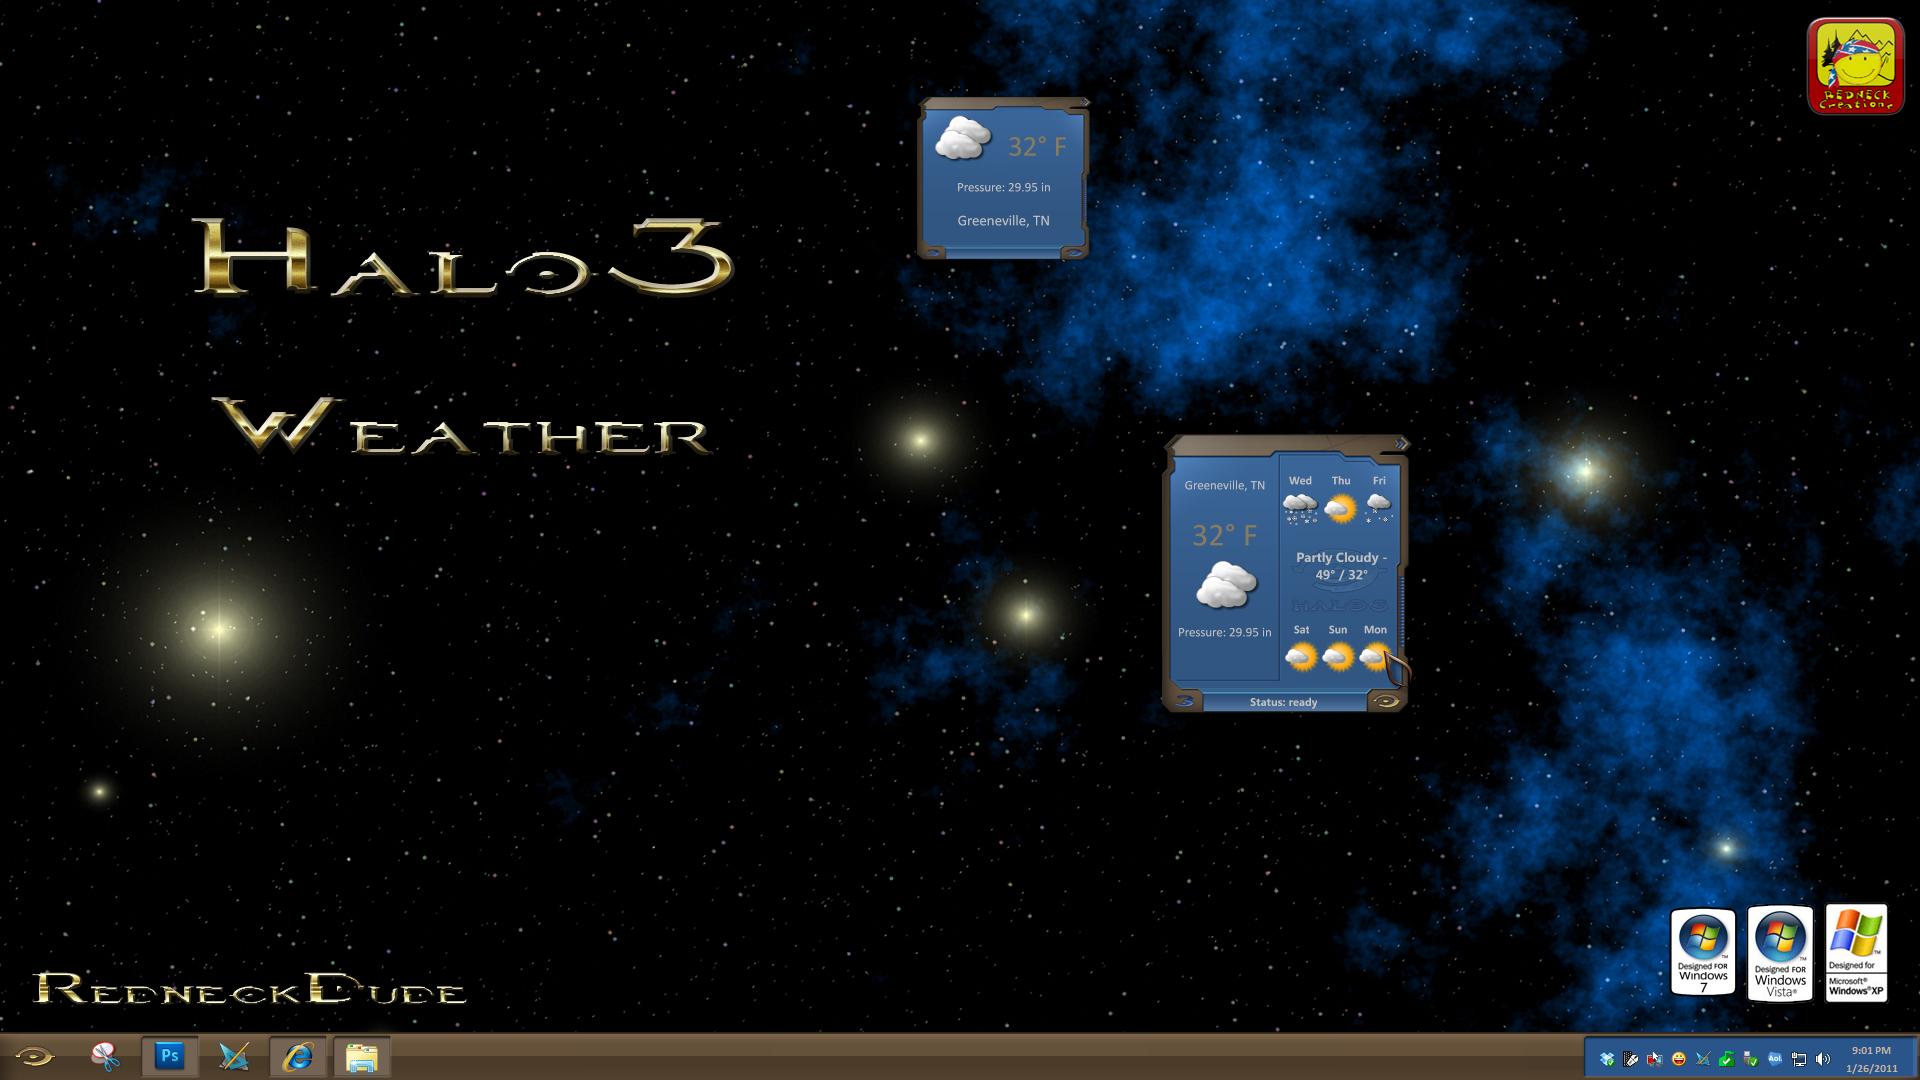 Halo3 Weather_Widget